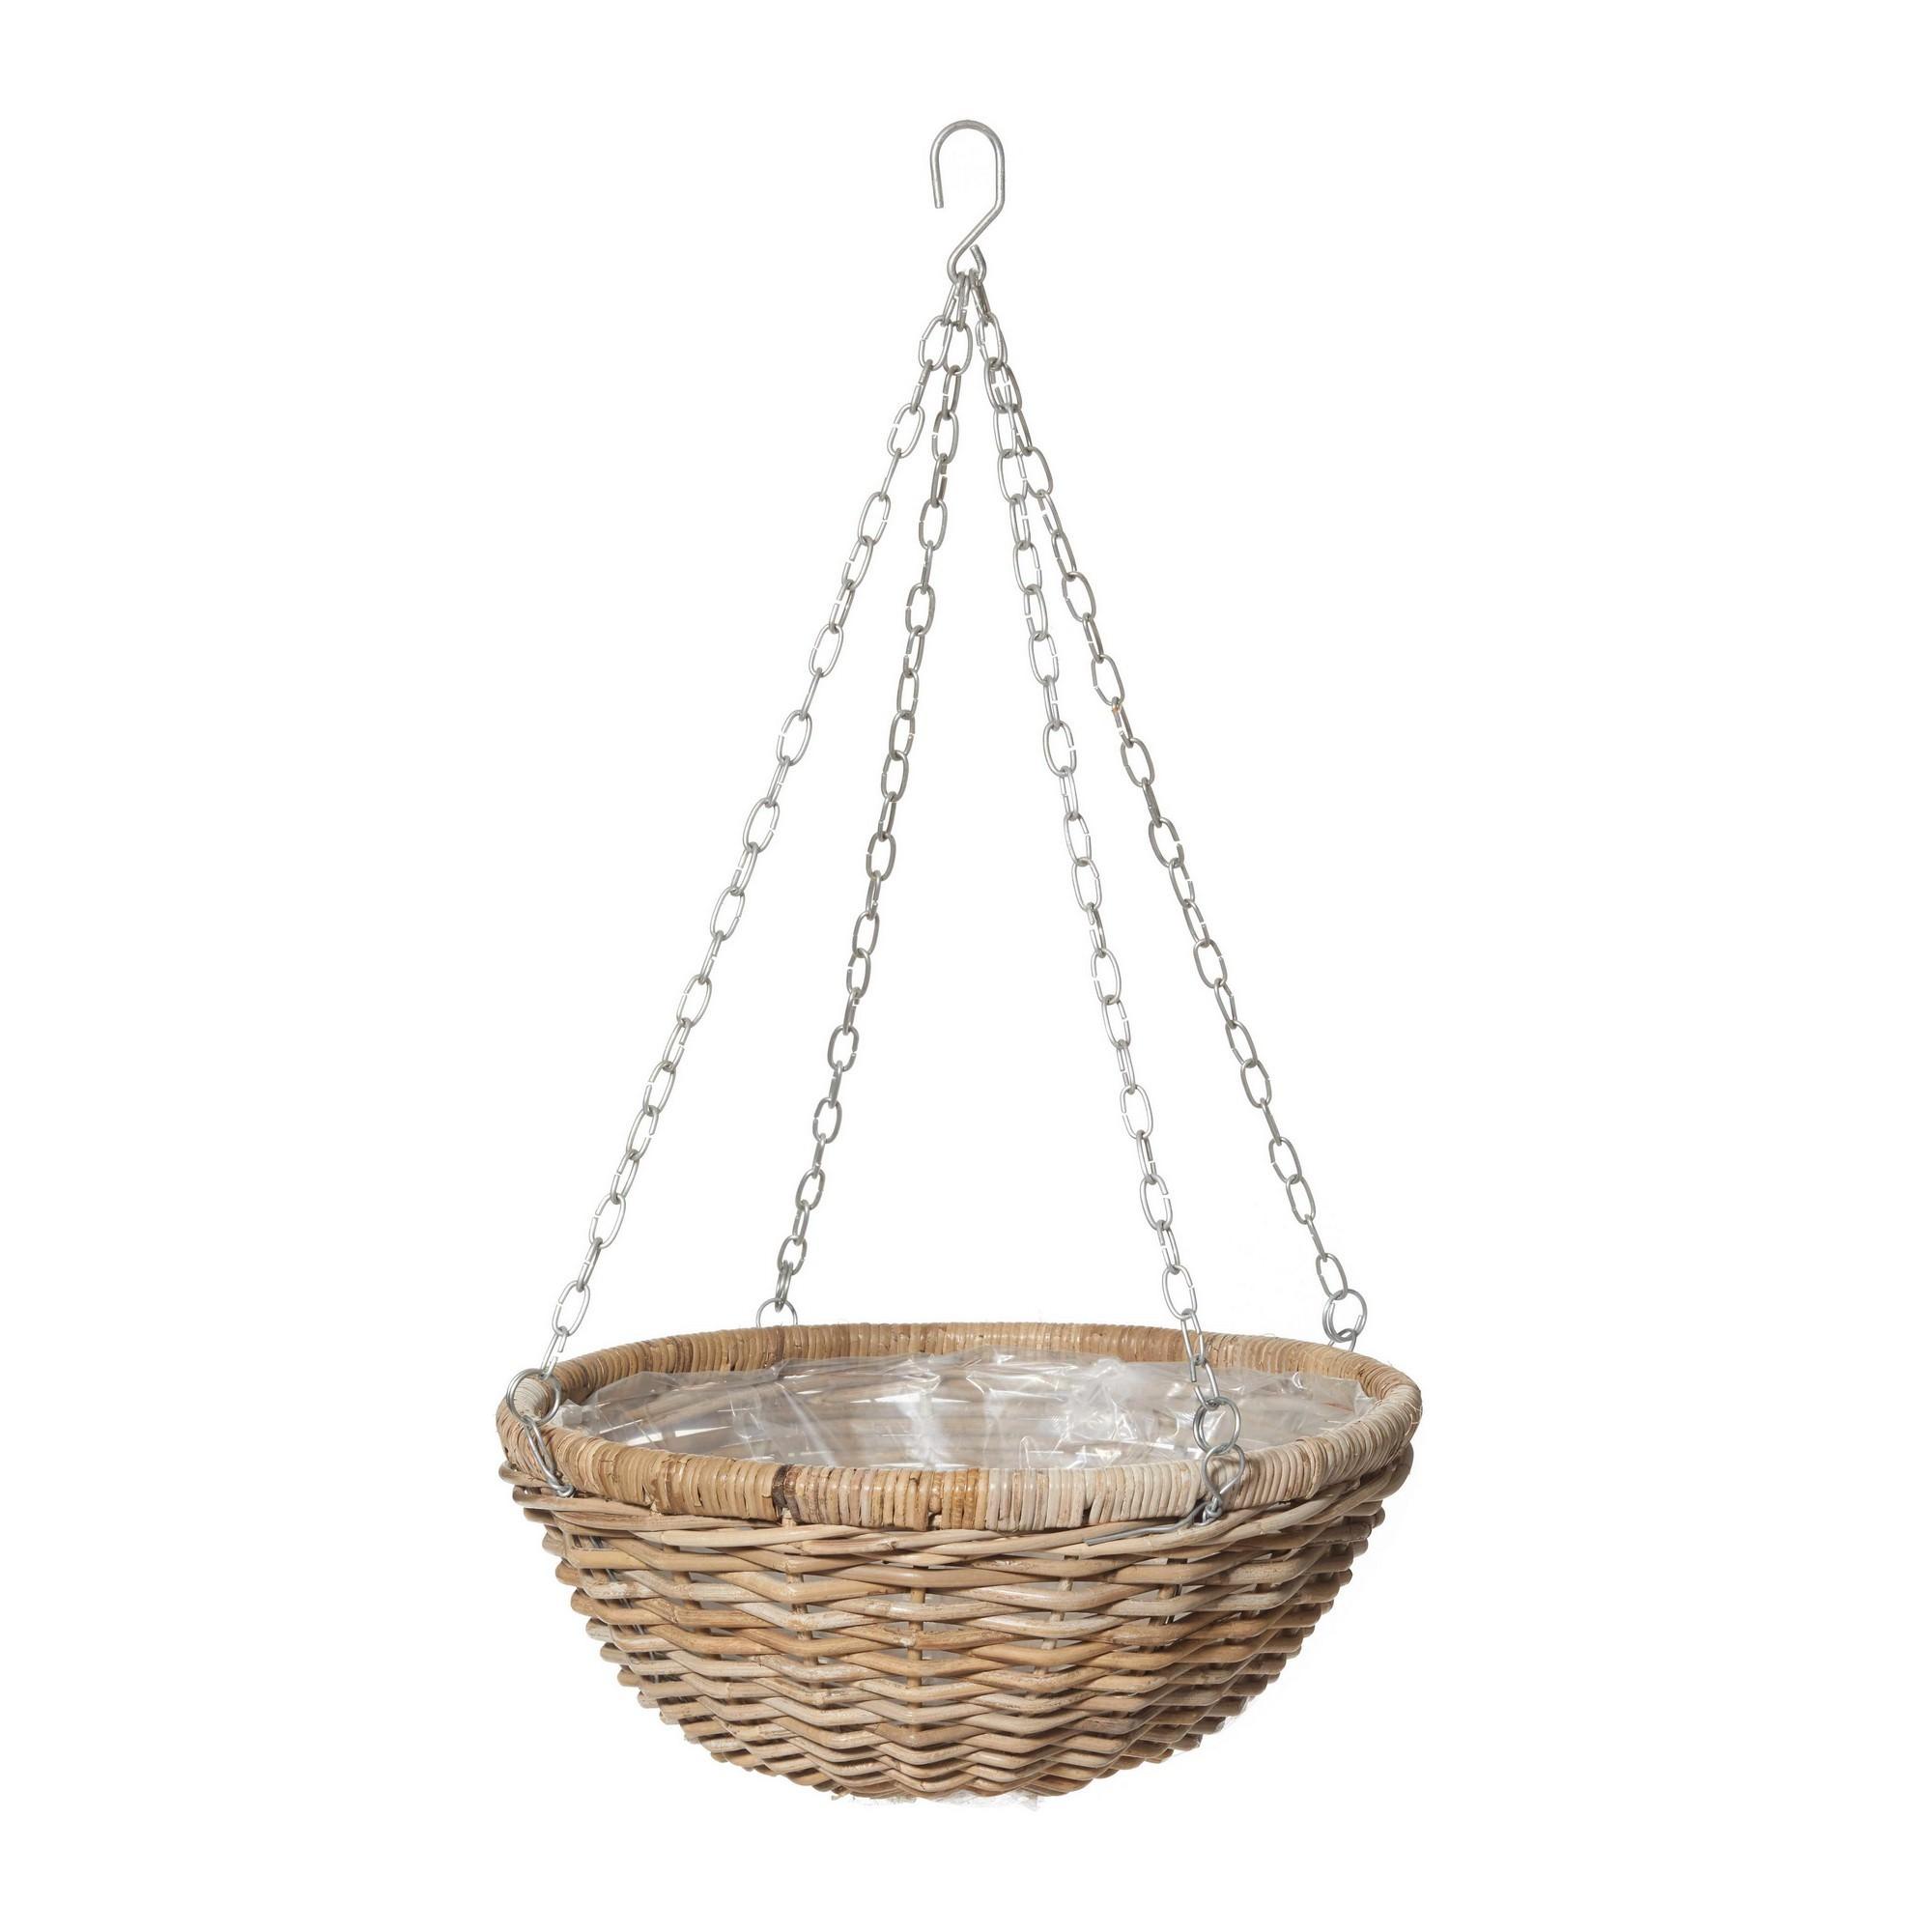 Maysa Hanging Wicker Bowl Planter